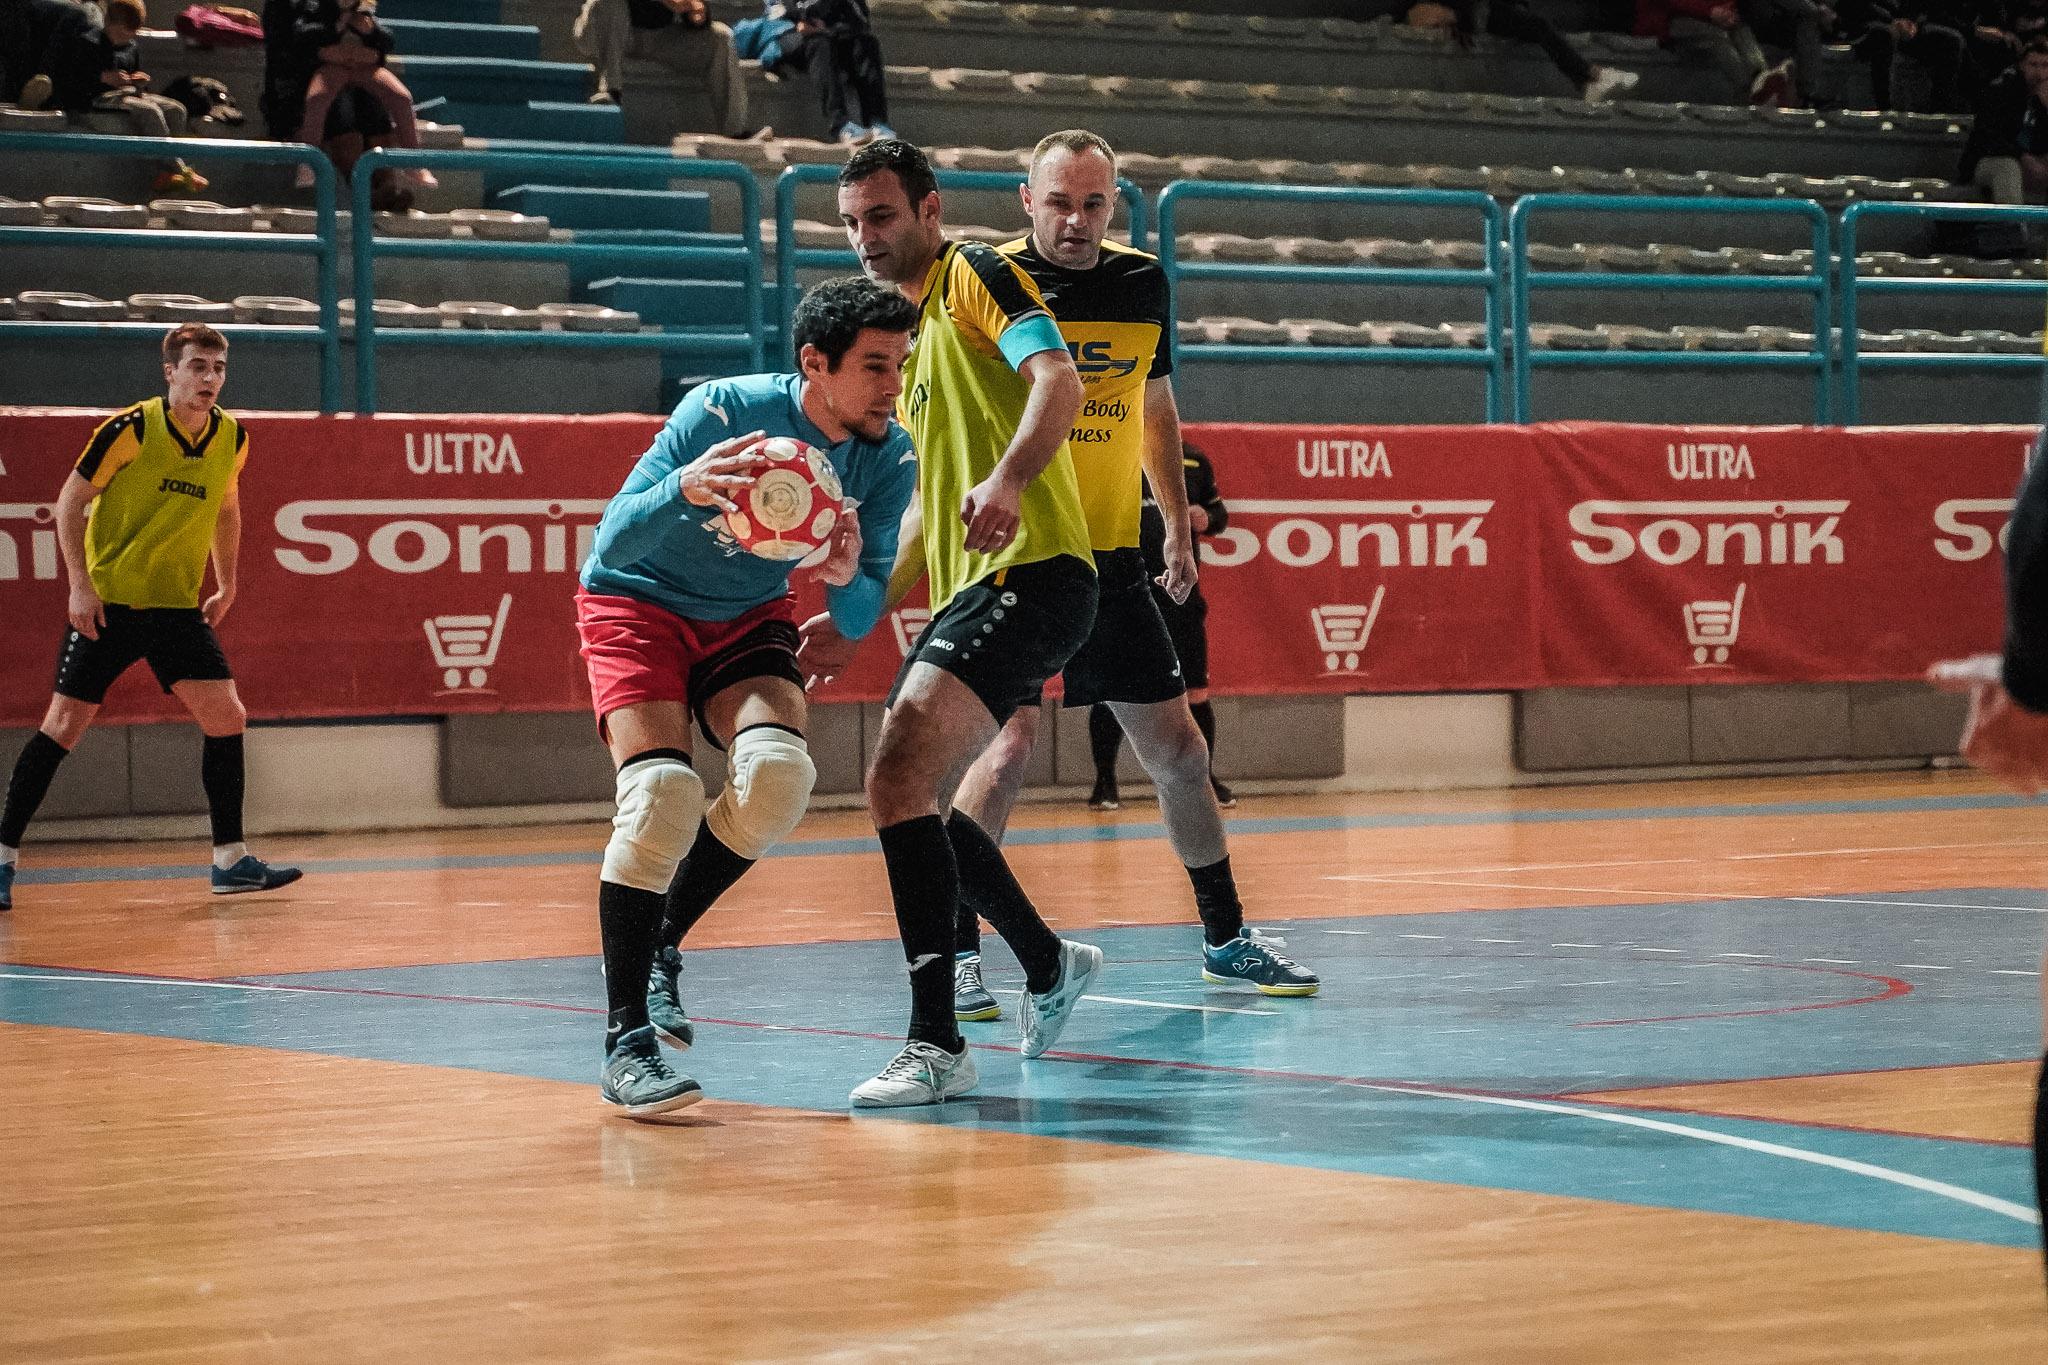 2. ŽMNL: Šarmerska Serie B je tu, sjednite i uživajte